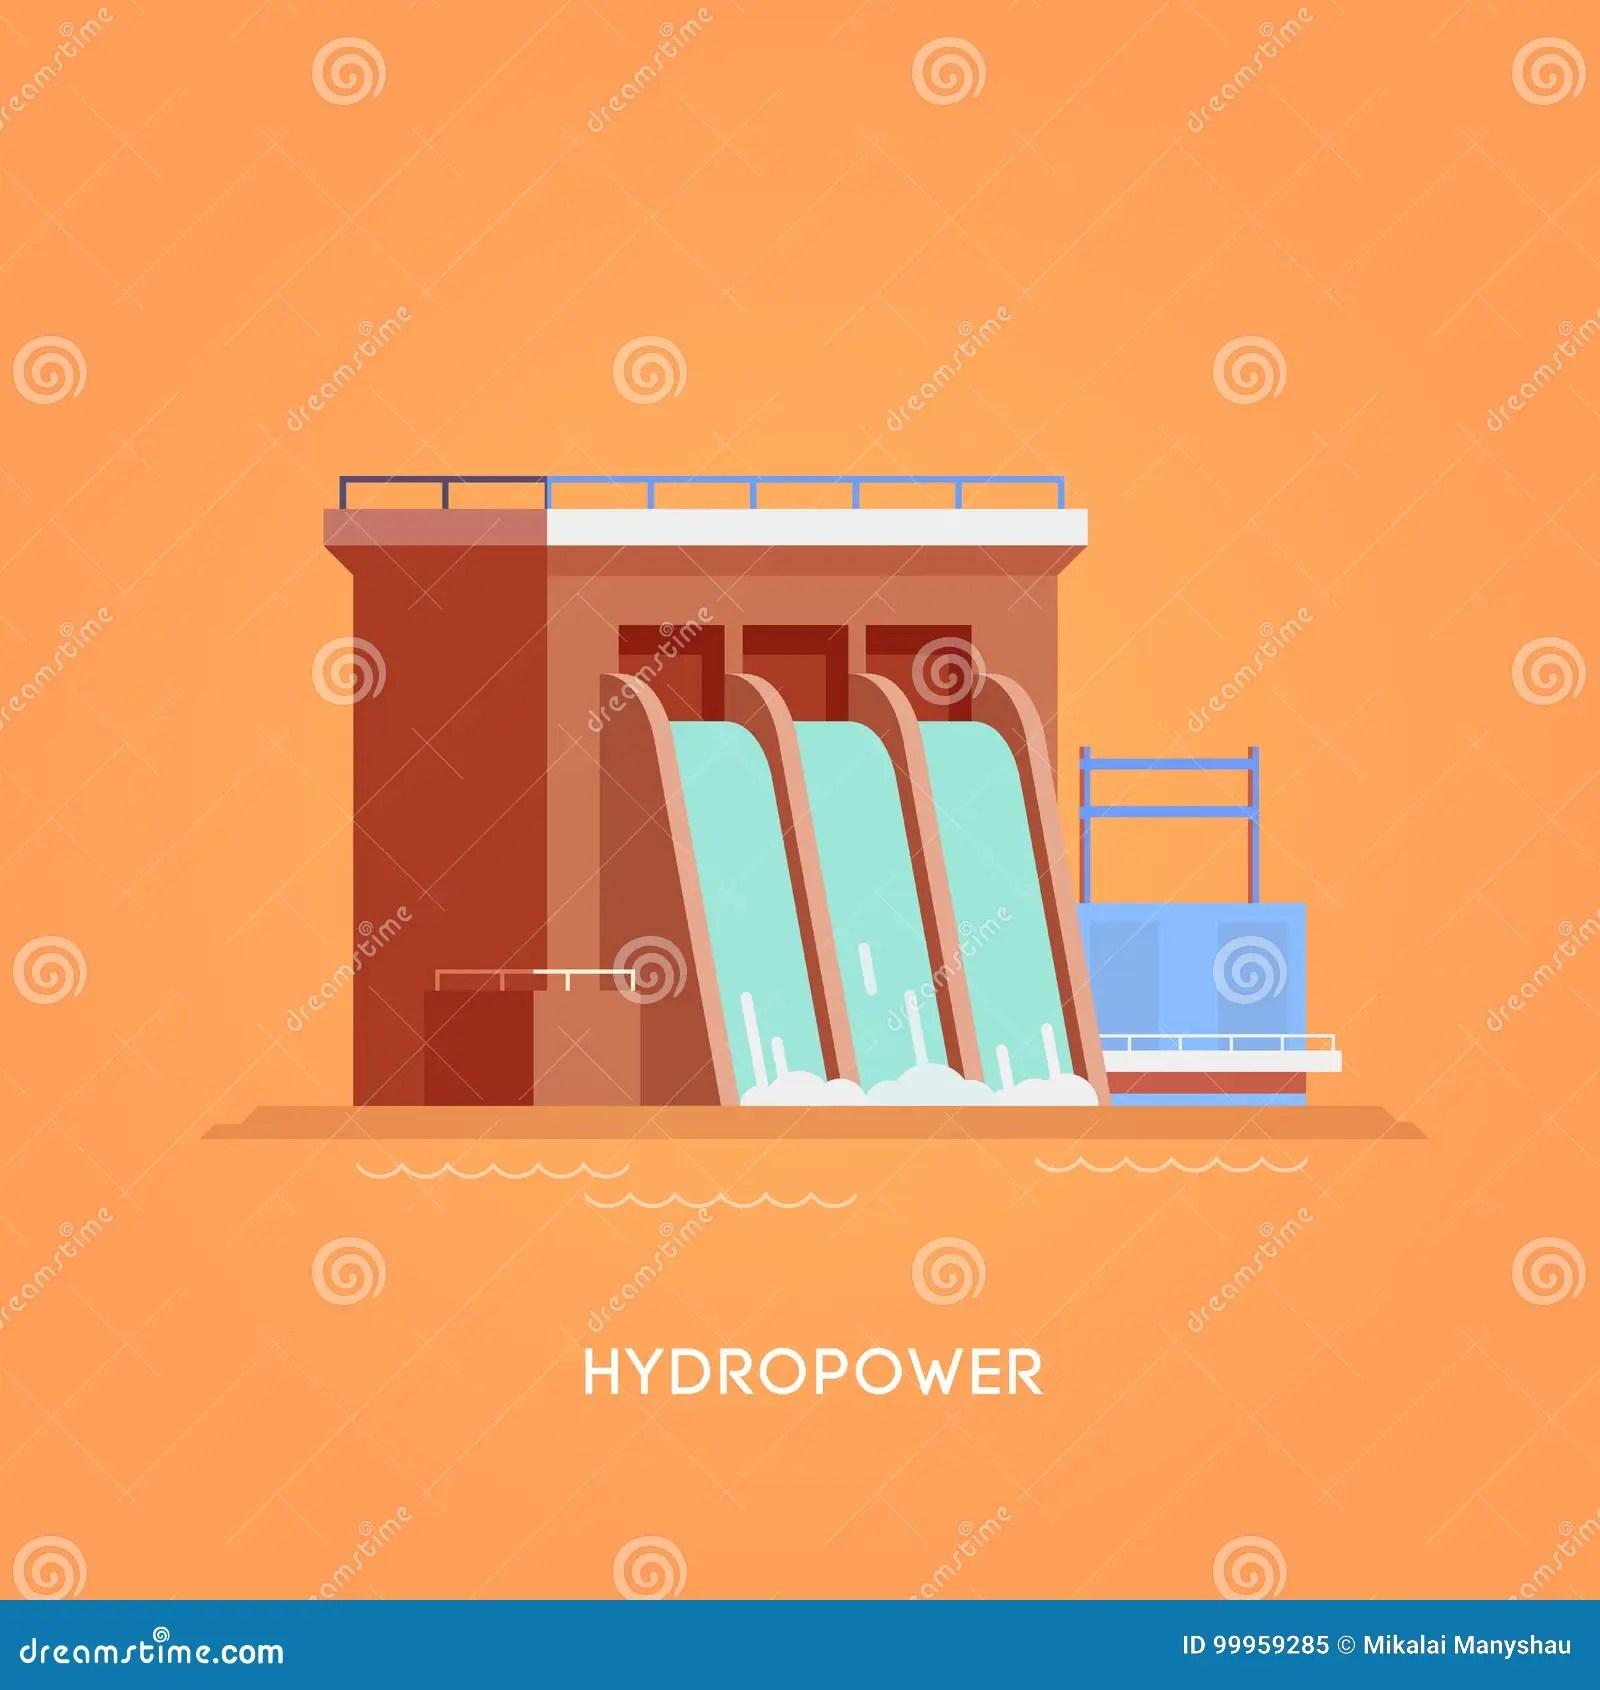 Alternative Sources Of Energy Stock Vector